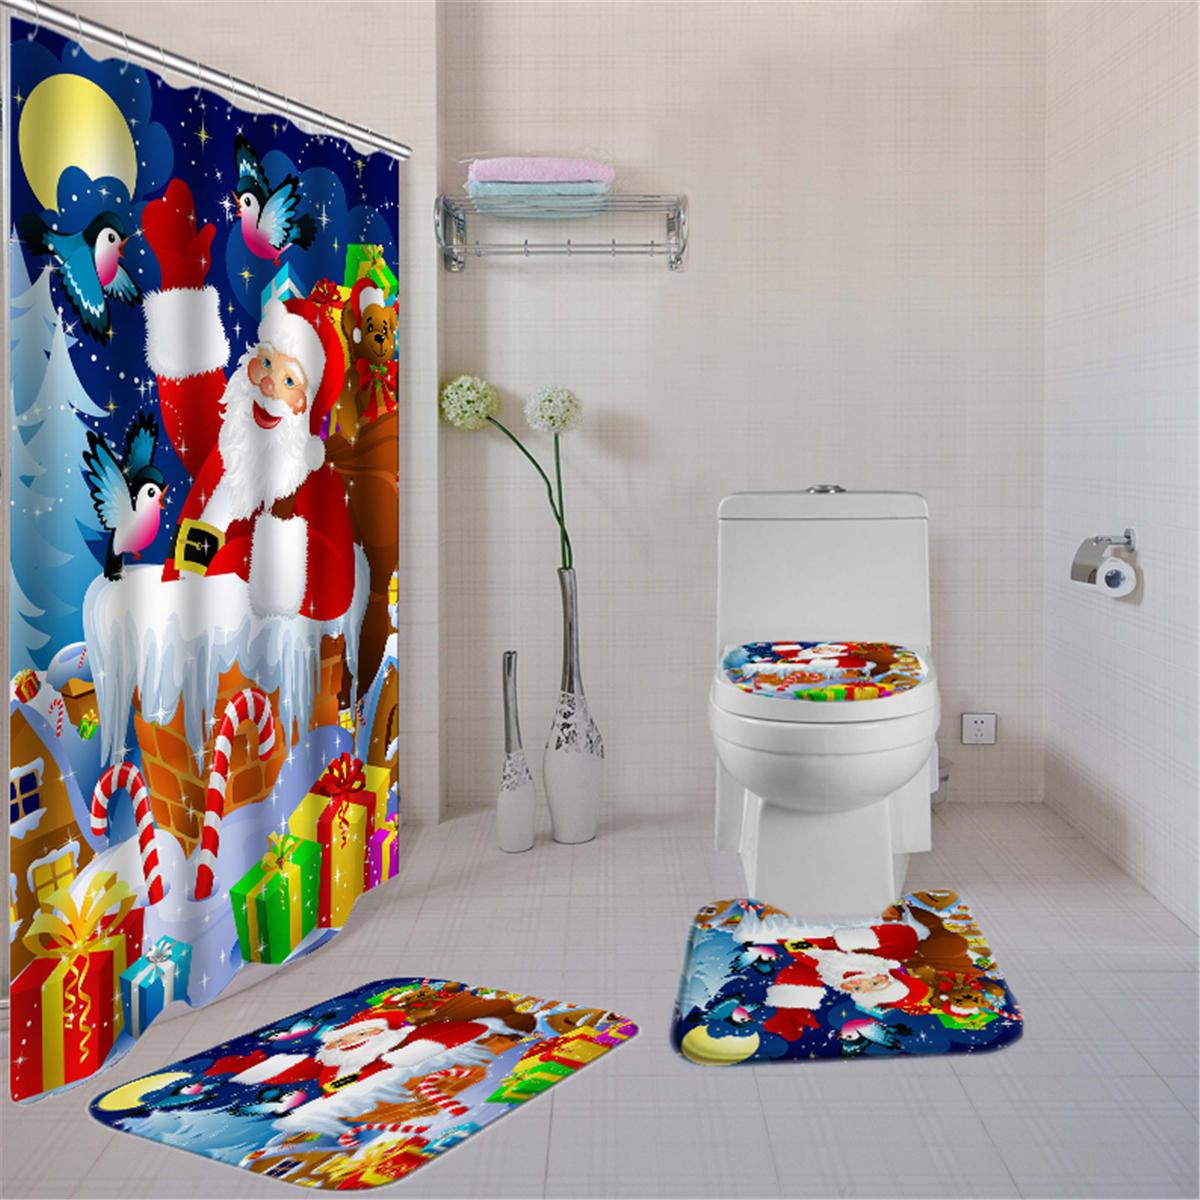 180x180 Santa Claus Christmas Gifts Shower Curtain With Hooks Waterproof Bathroom Carpet Set